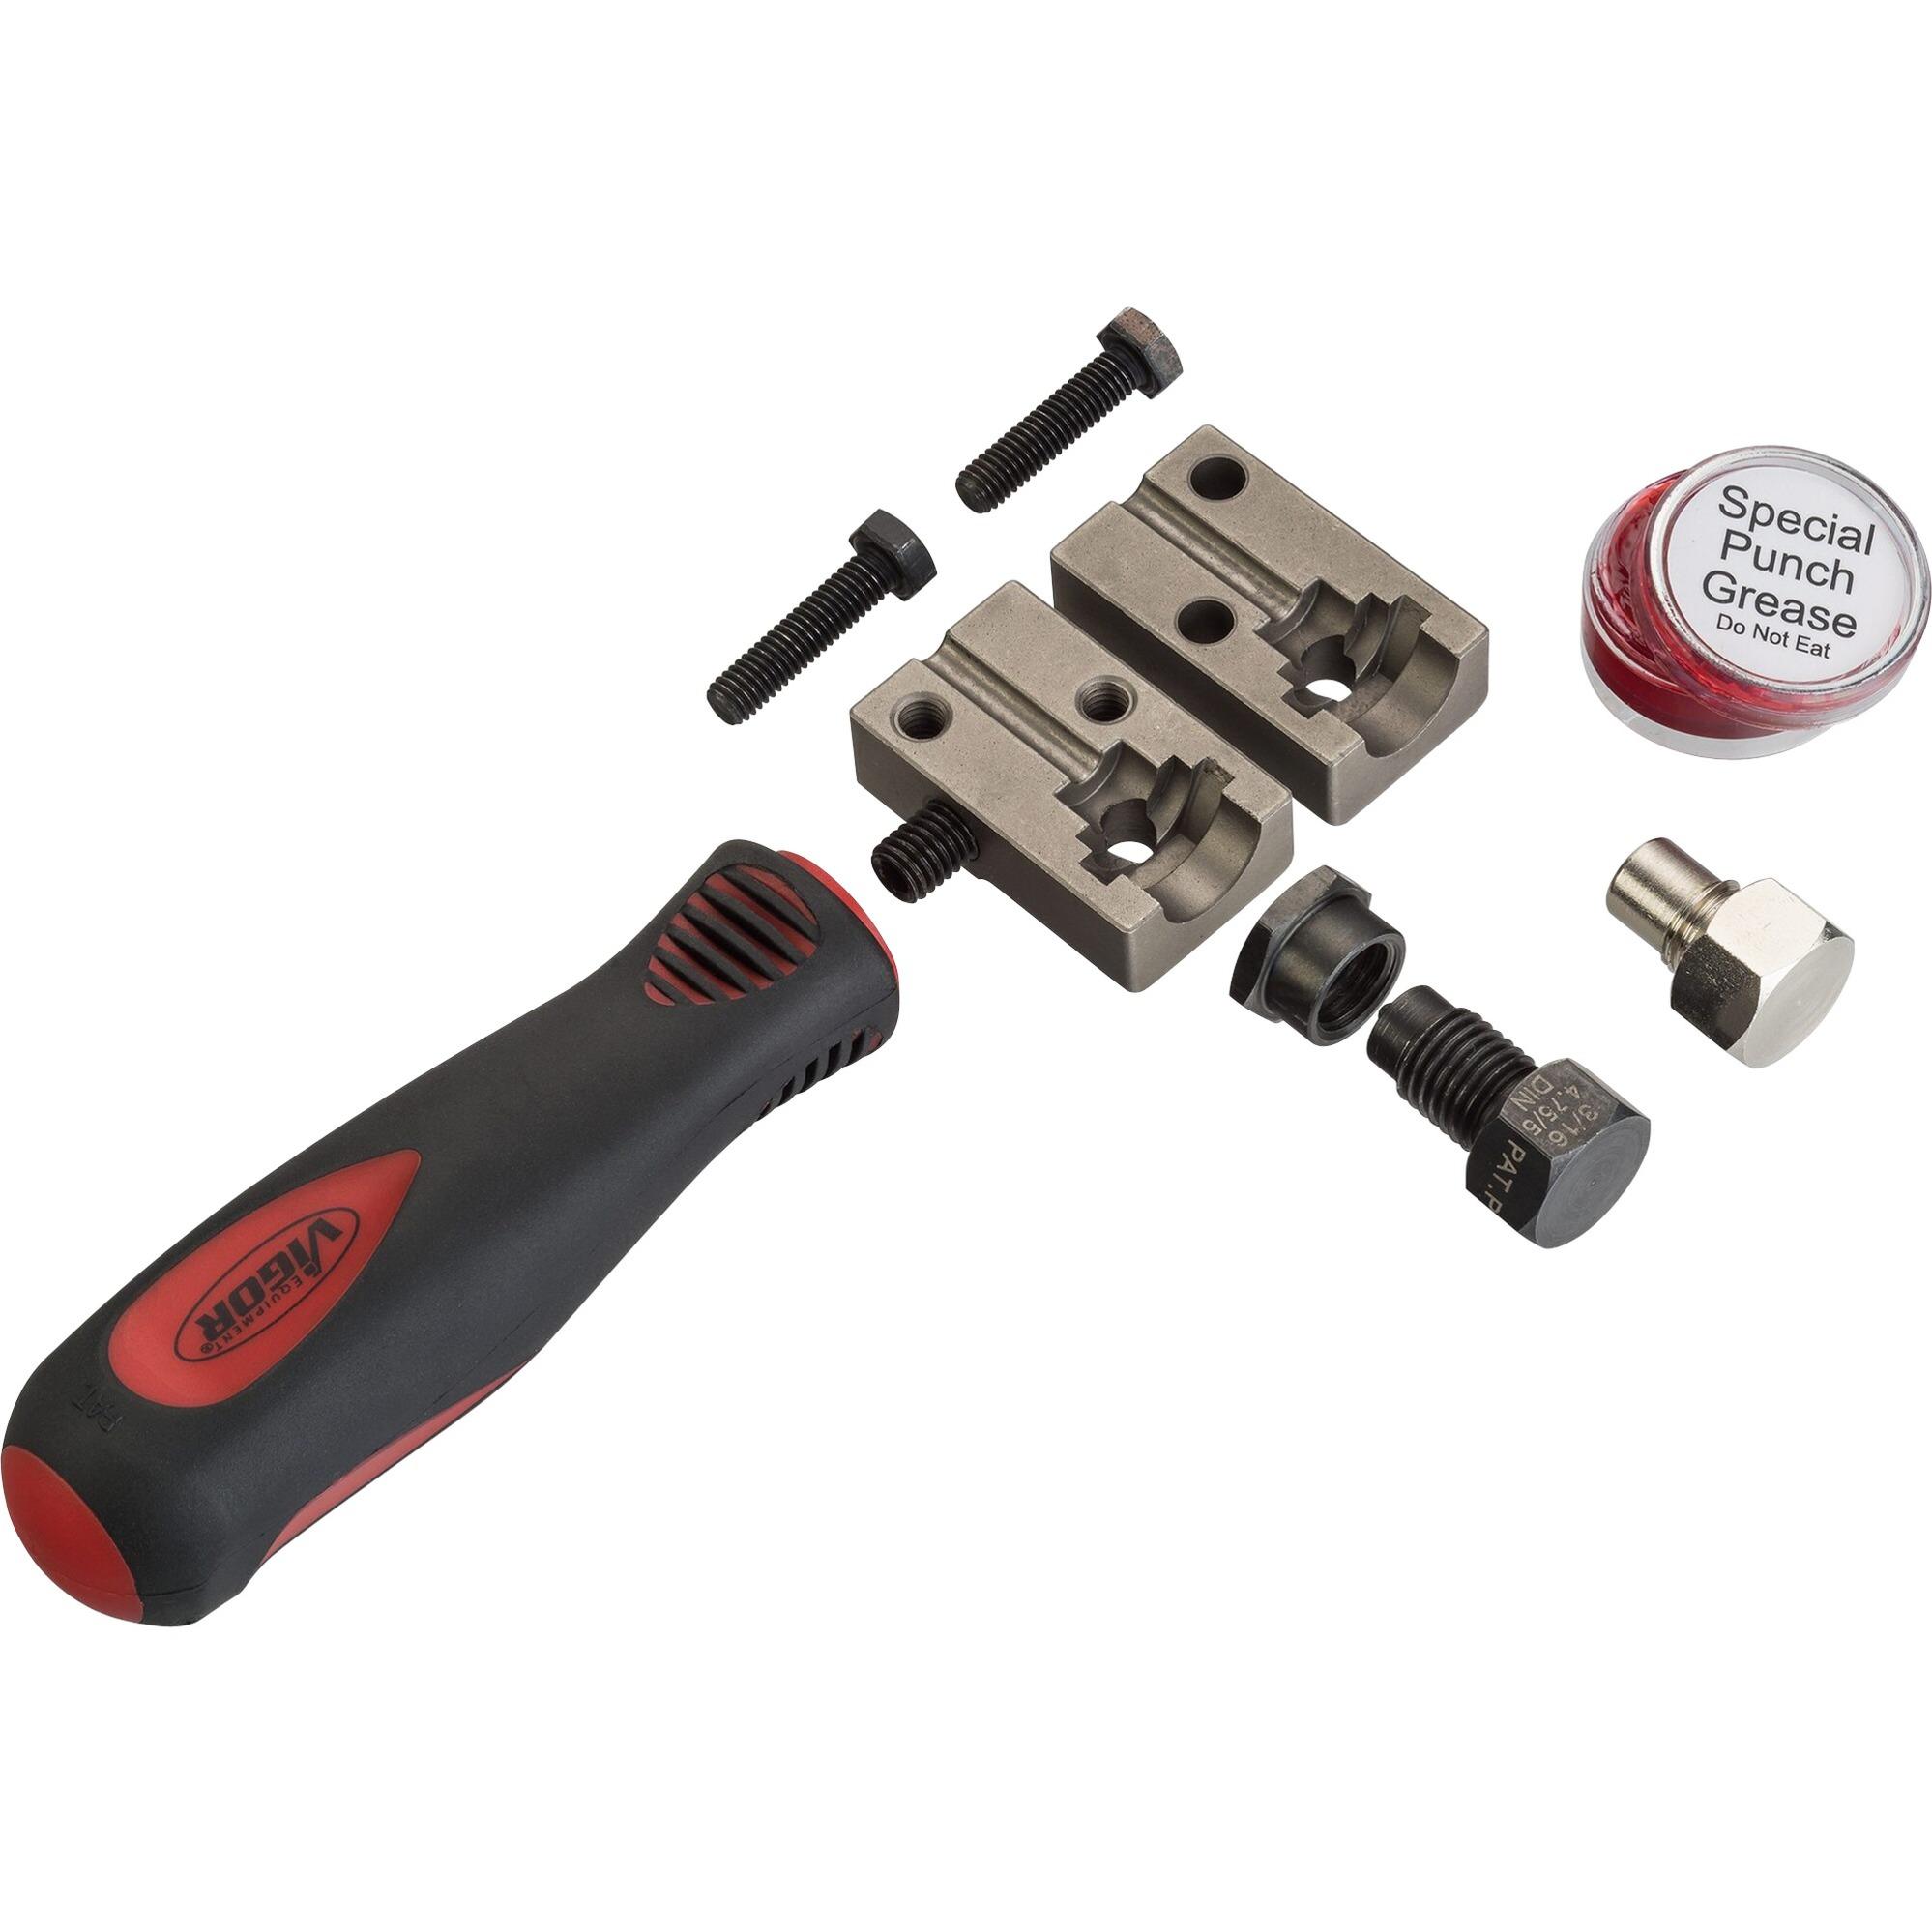 Image of Bördelgerät DIN für 4,75mm, 3-teilig, Bördel-Werkzeug